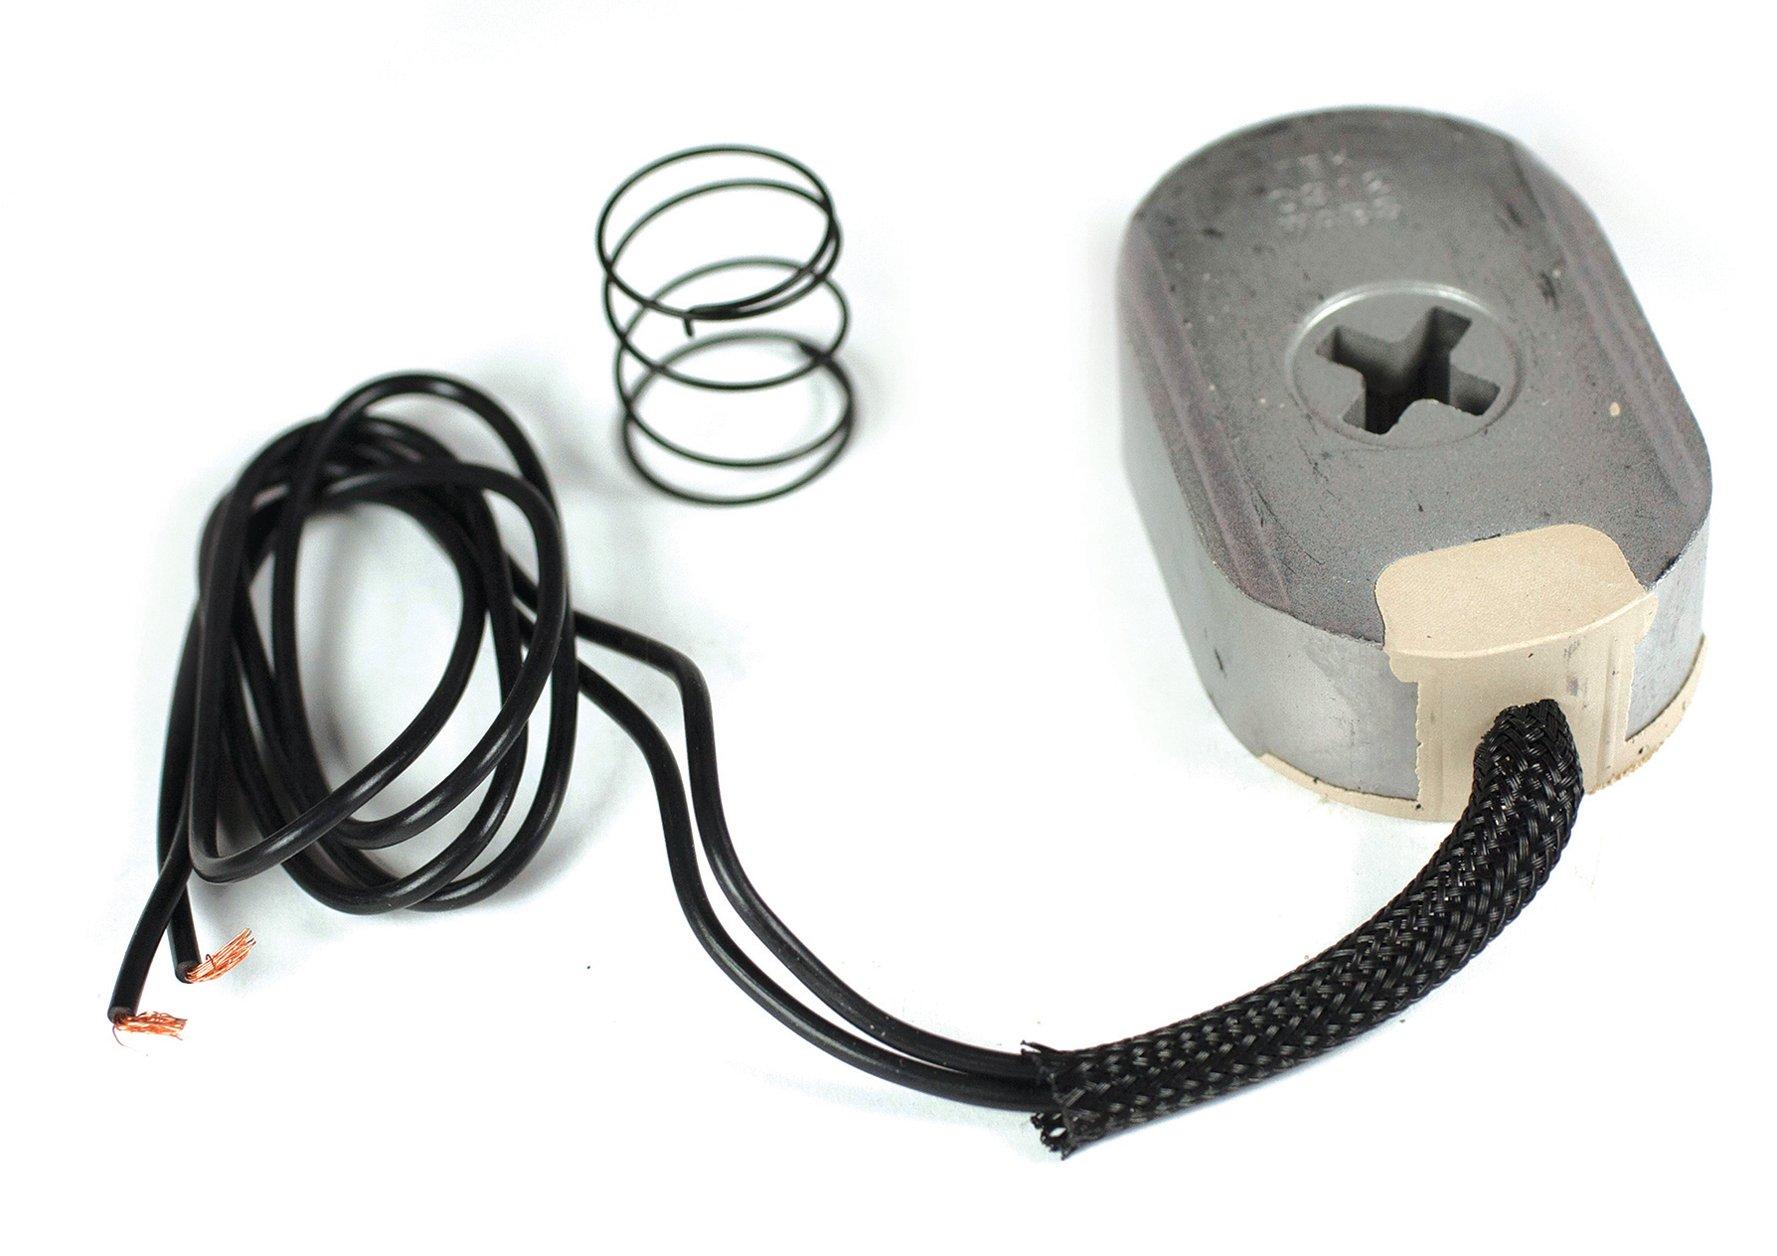 Husky 30819 12'' x 2'' Electric Brake Magnet Kit